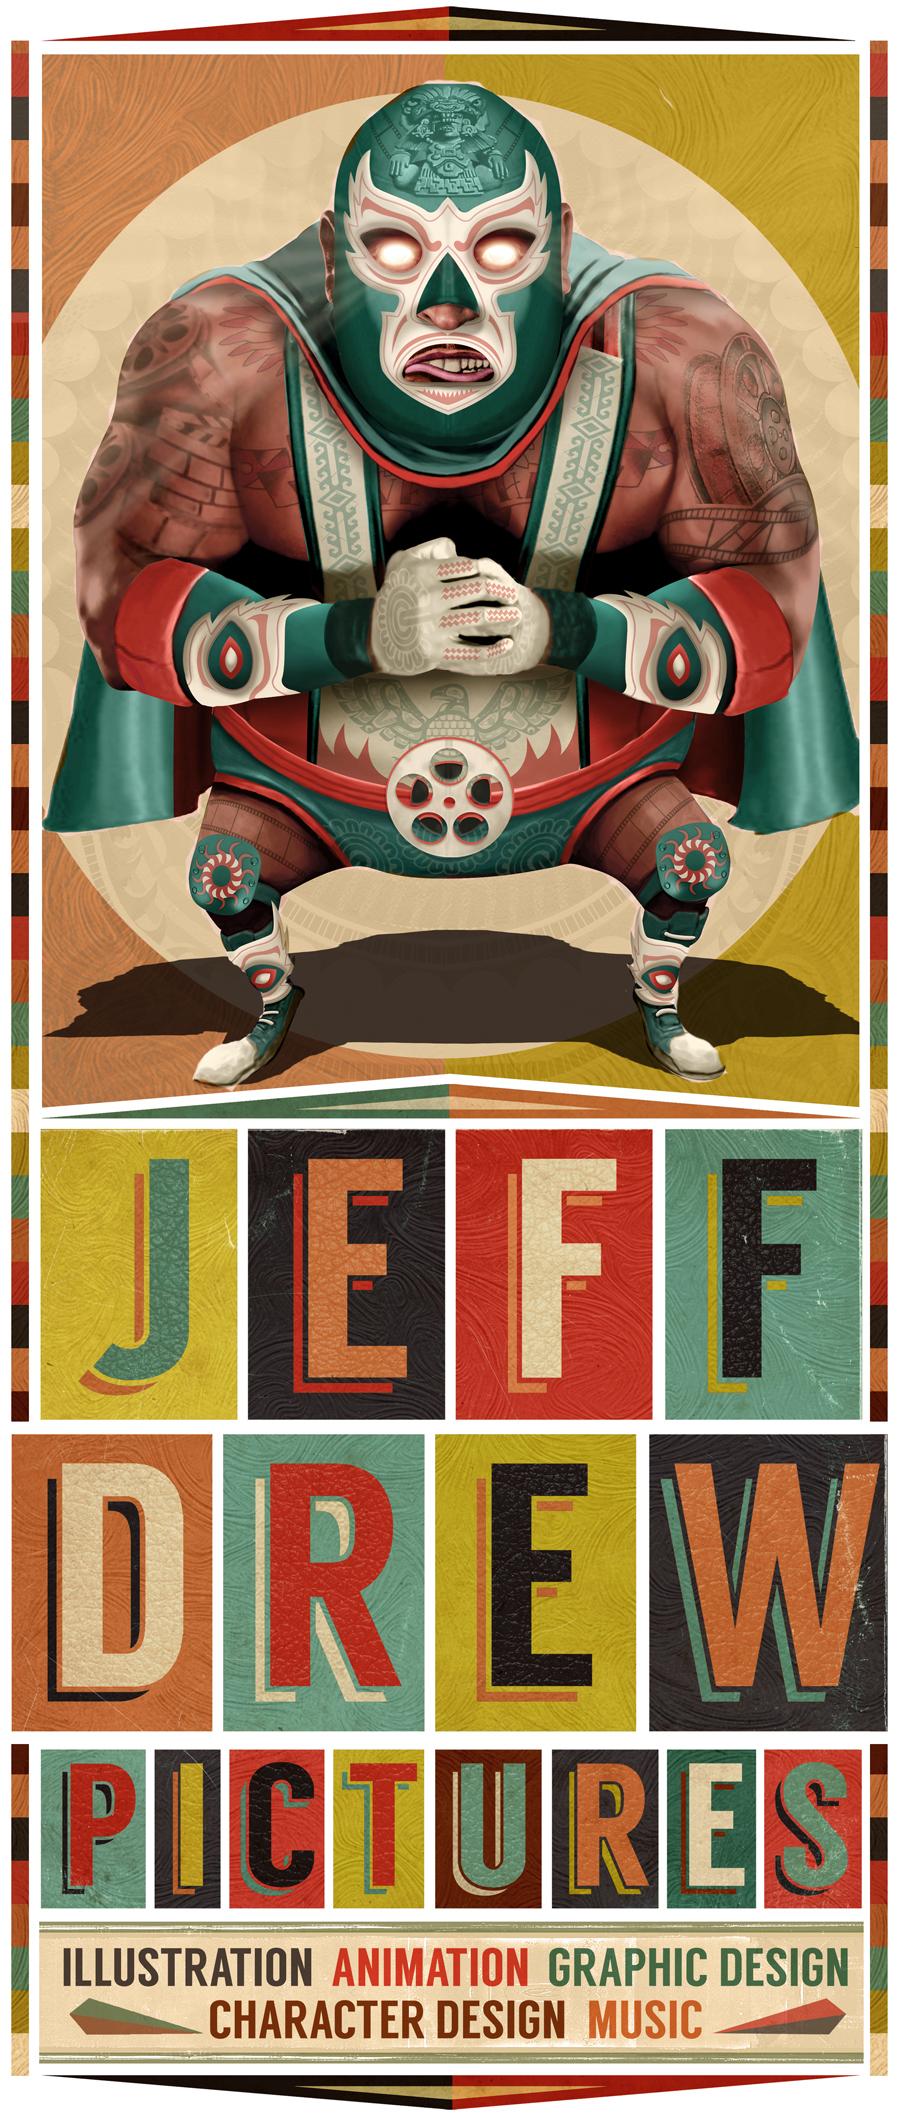 jeff drew